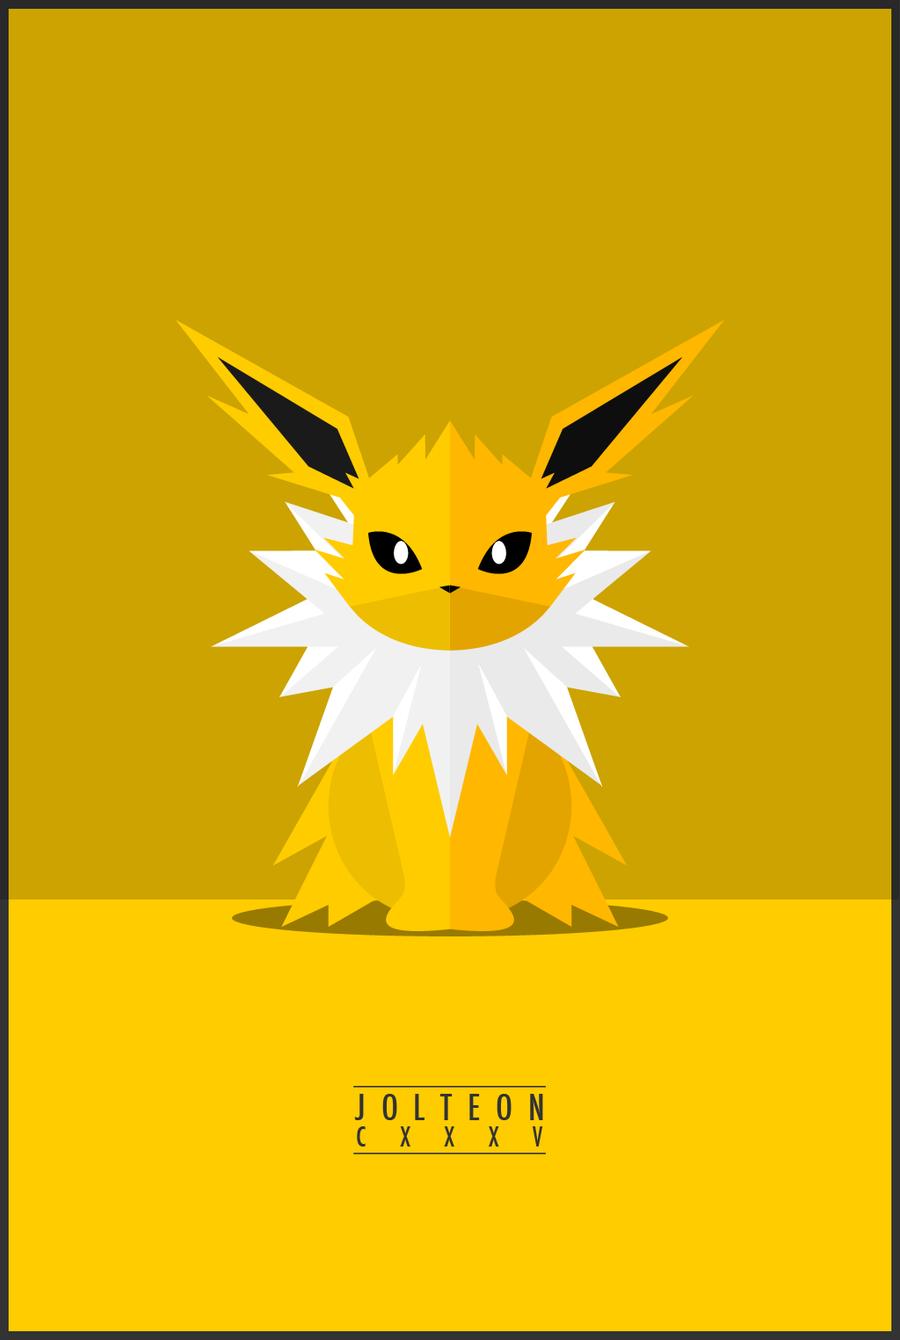 Pokemon Electric Type Wallpaper | www.imgkid.com - The ...